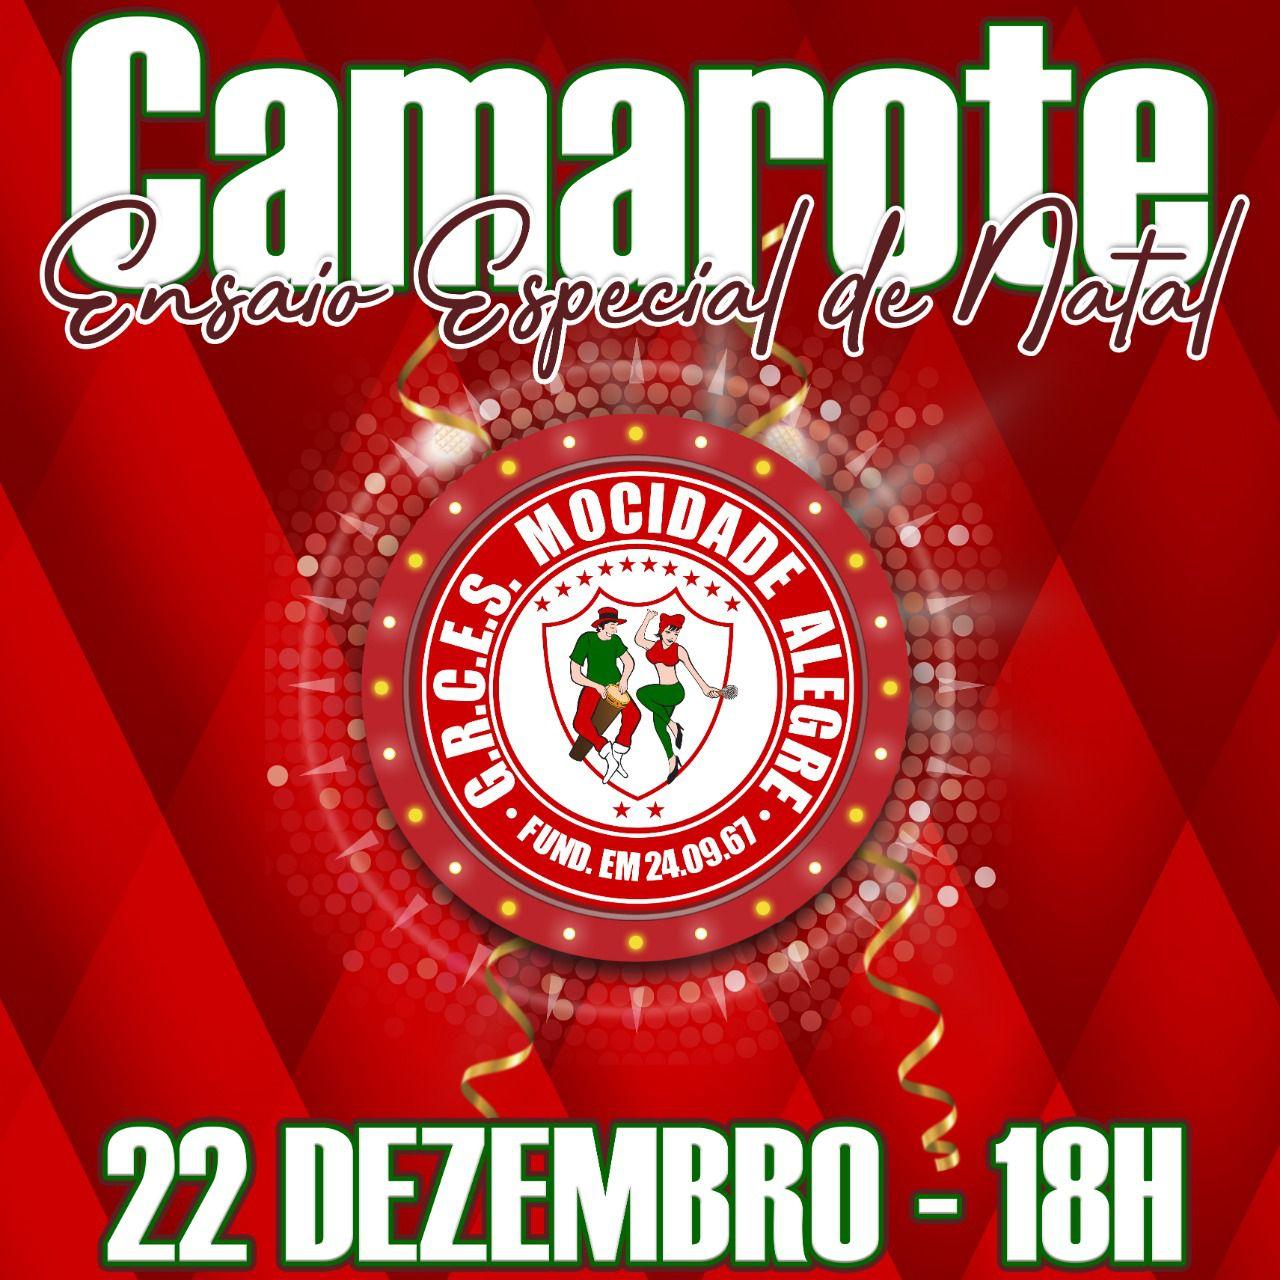 CAMAROTE - 22-12-2019 - ENSAIO GERAL  - Mocidade Alegre